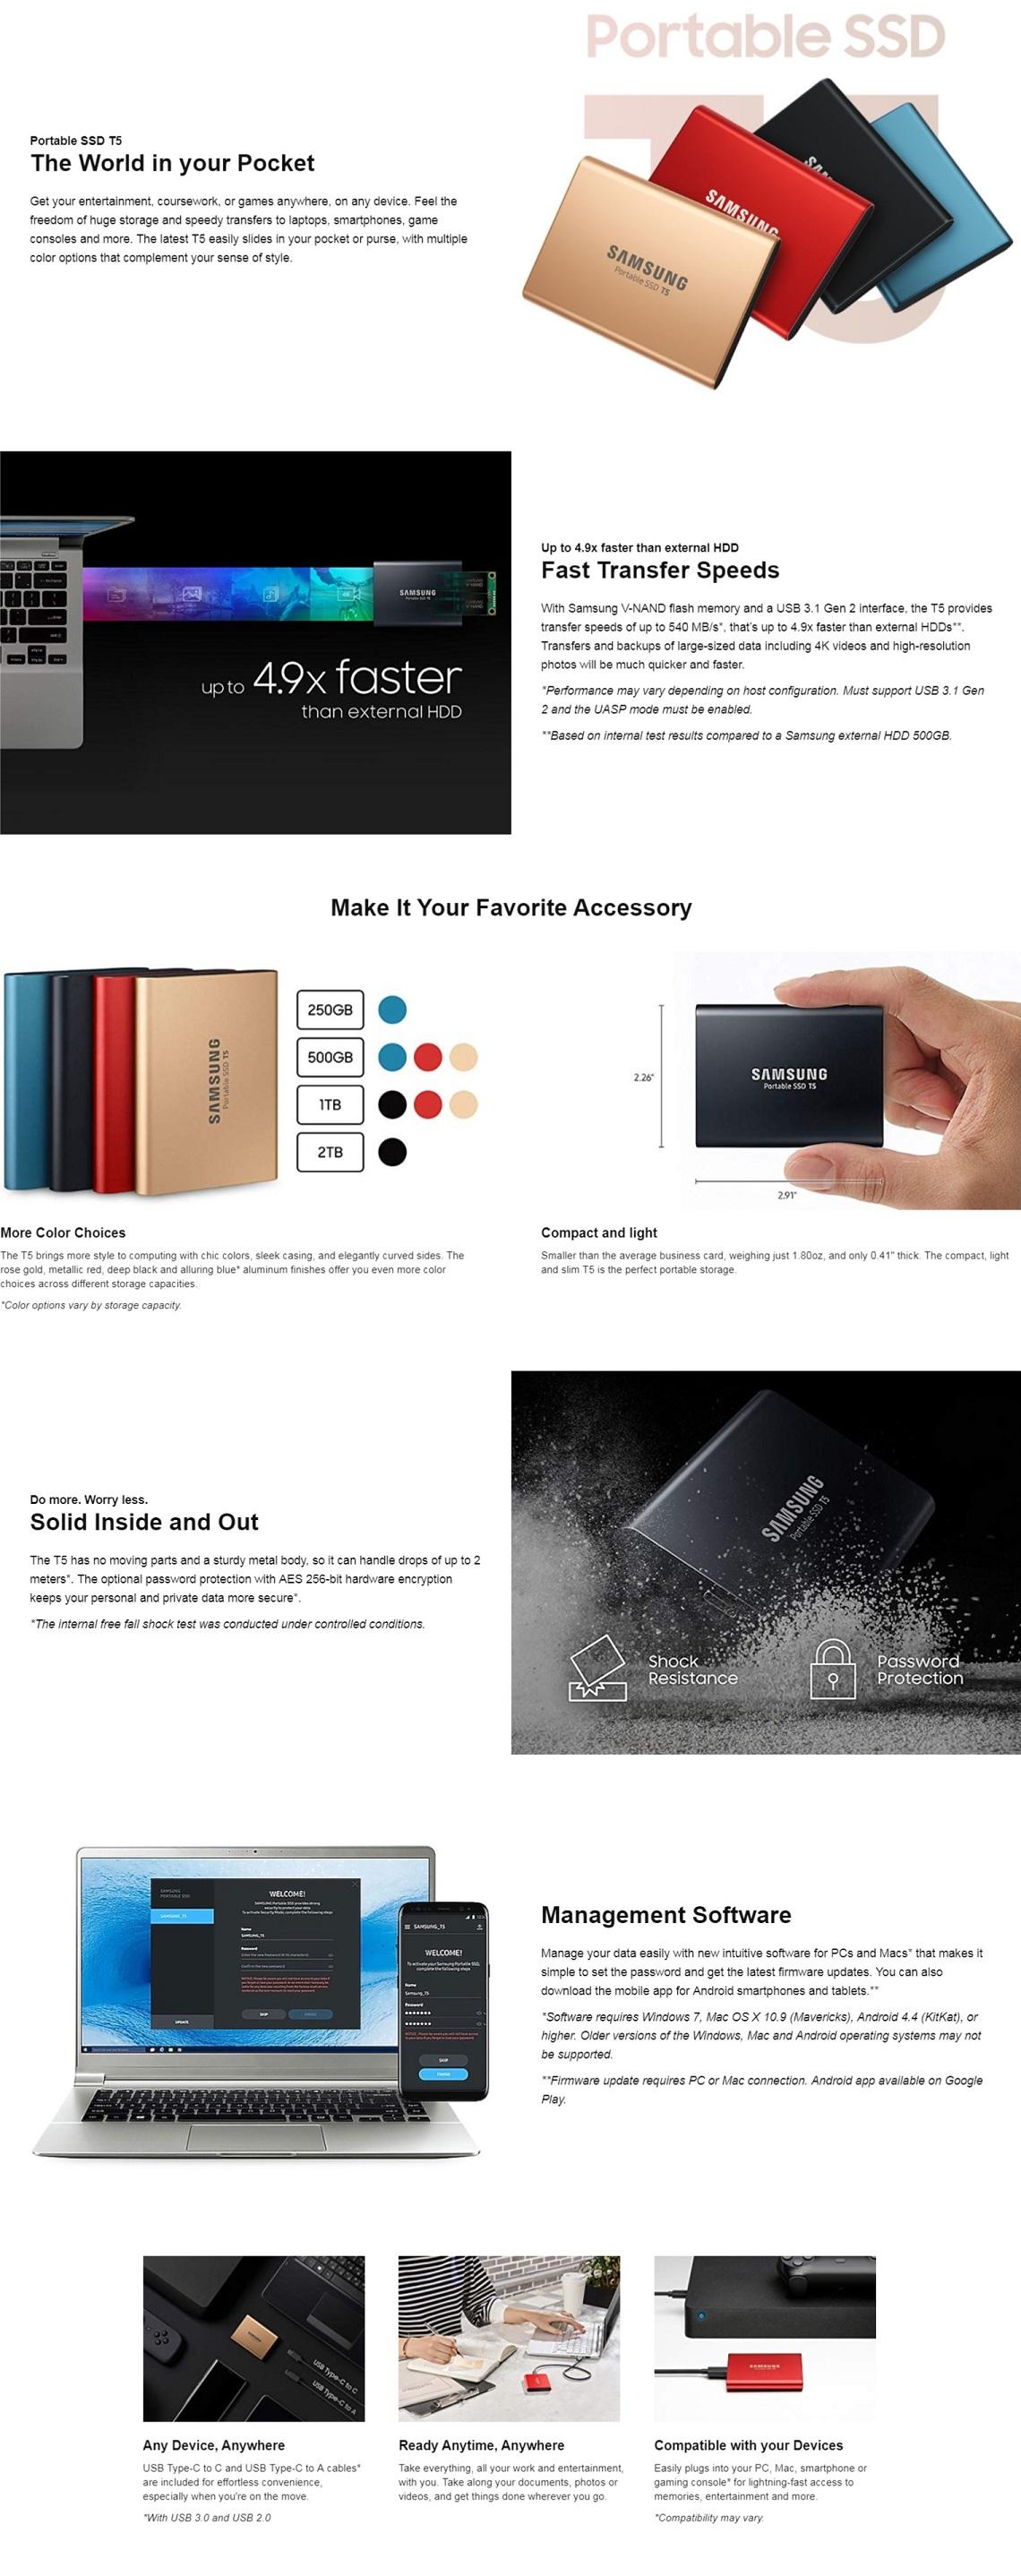 Samsung 2TB T5 Portable External SSD USB3.1 (Gen2) Type-C Shock Resistant Black